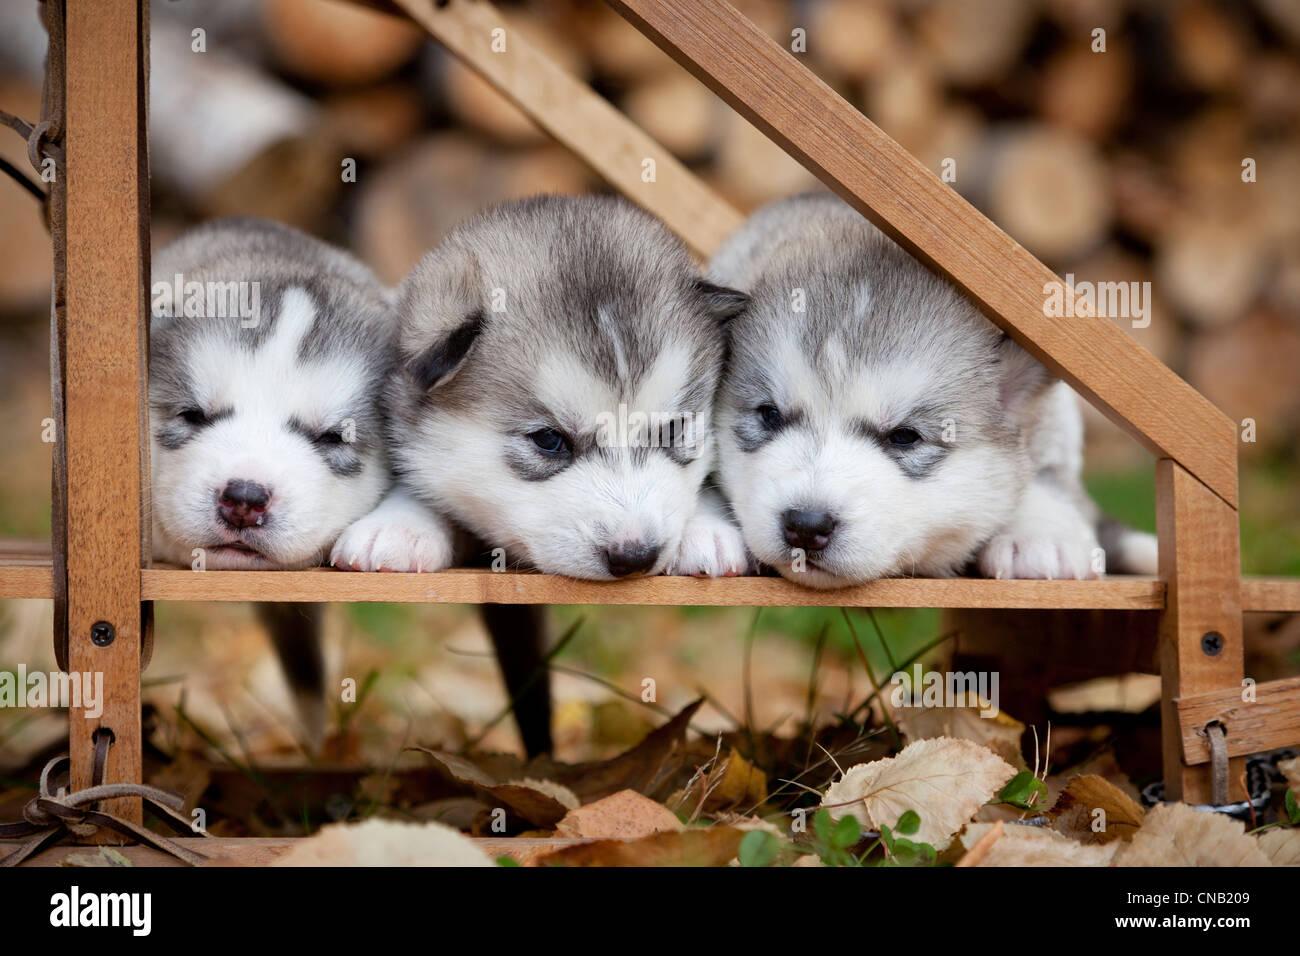 Pura Raza Siberian Husky cachorros de perros de trineo de madera pequeños, Alaska Foto de stock